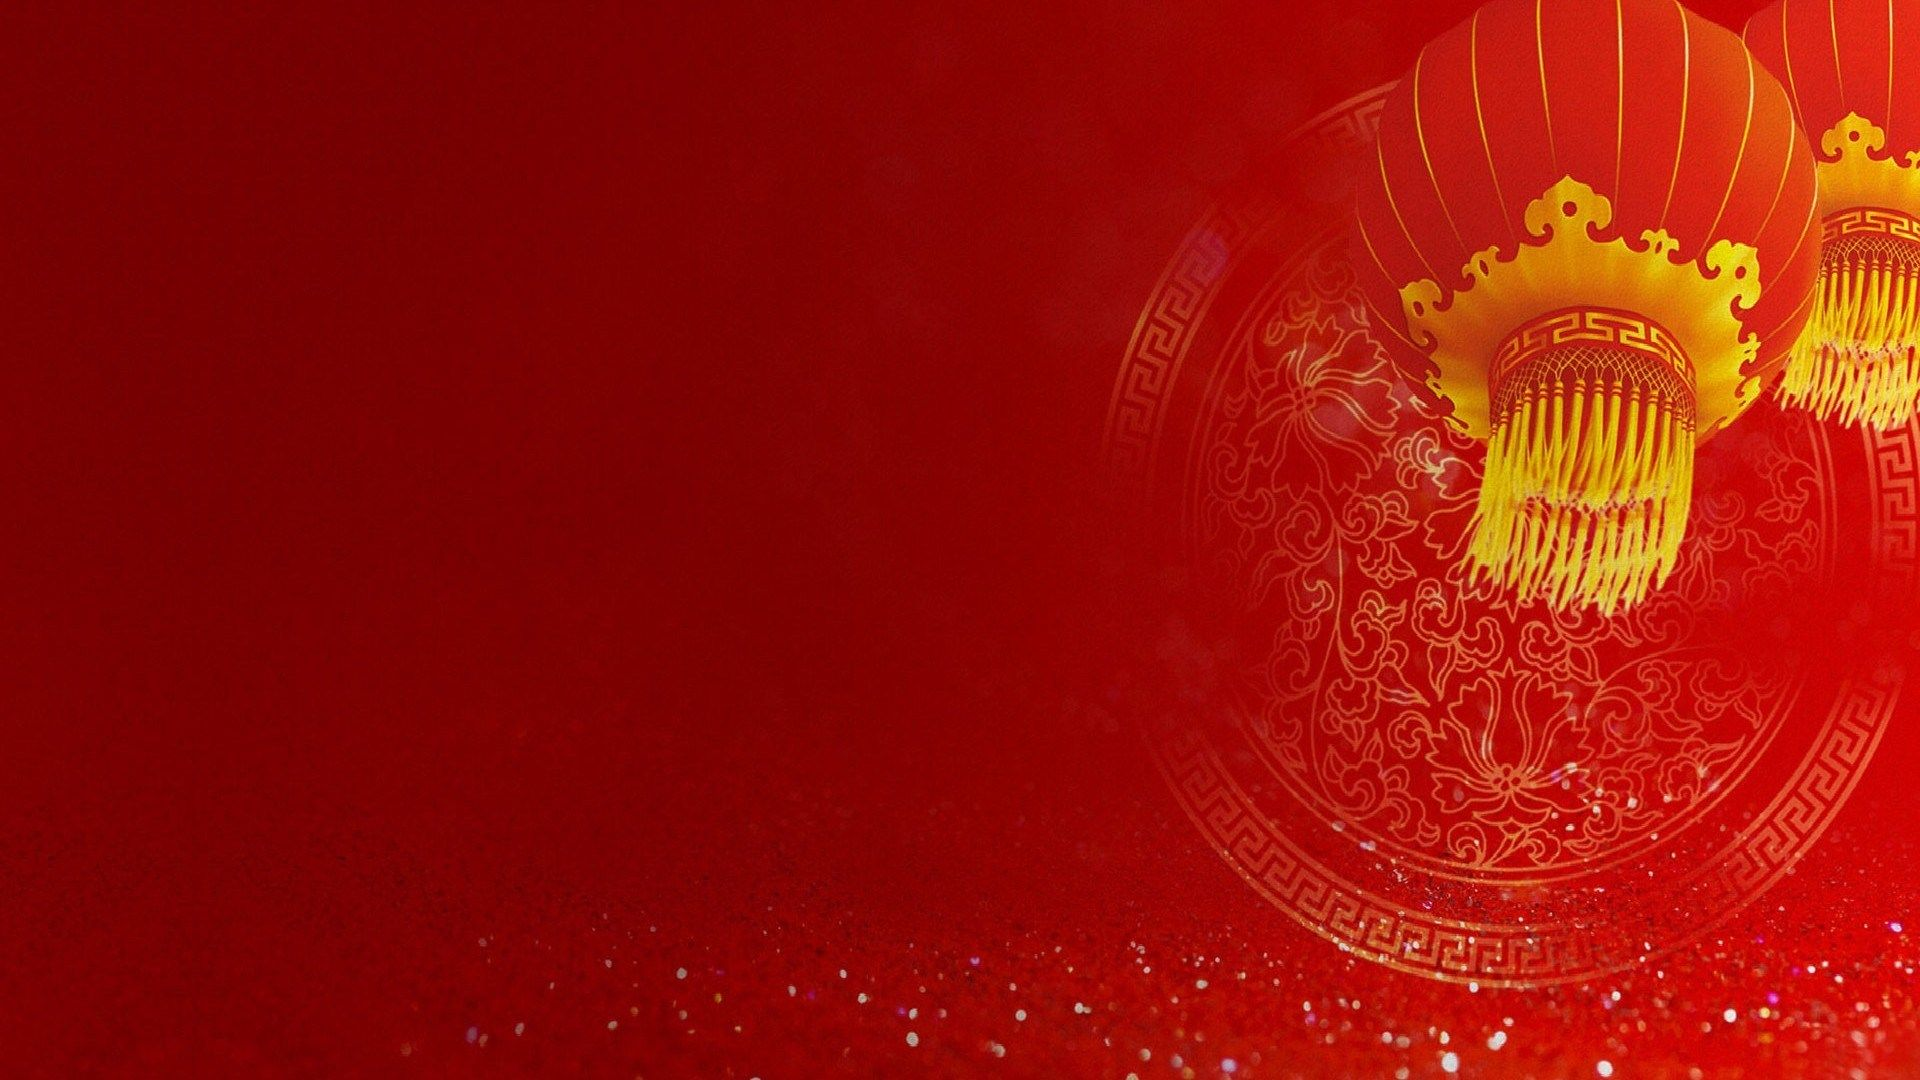 free download chinese wallpaper 1 Tahun baru imlek